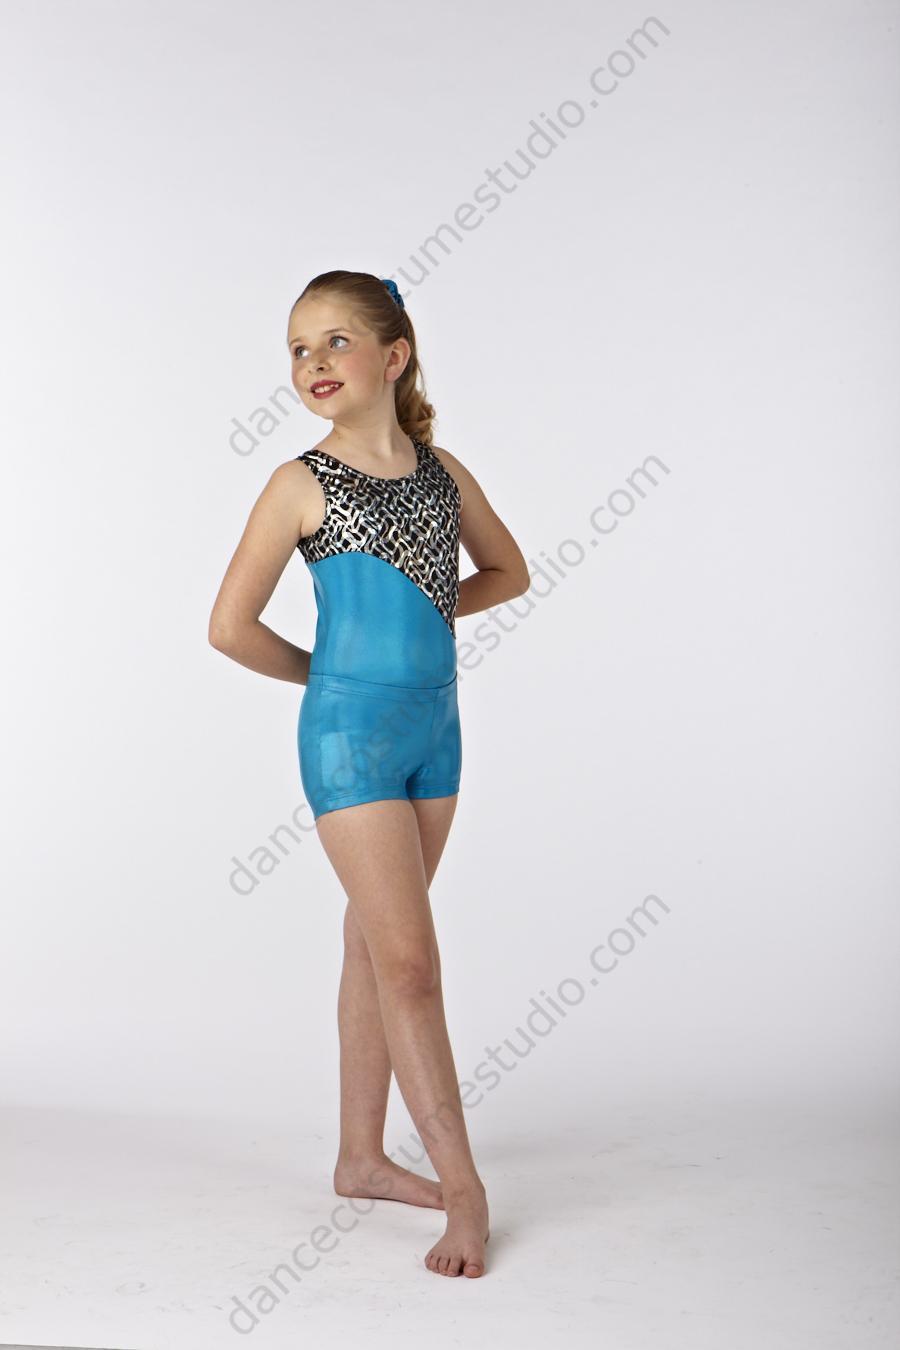 Gymnastics Leotards And Biketards - Performing Outfit Design Studio